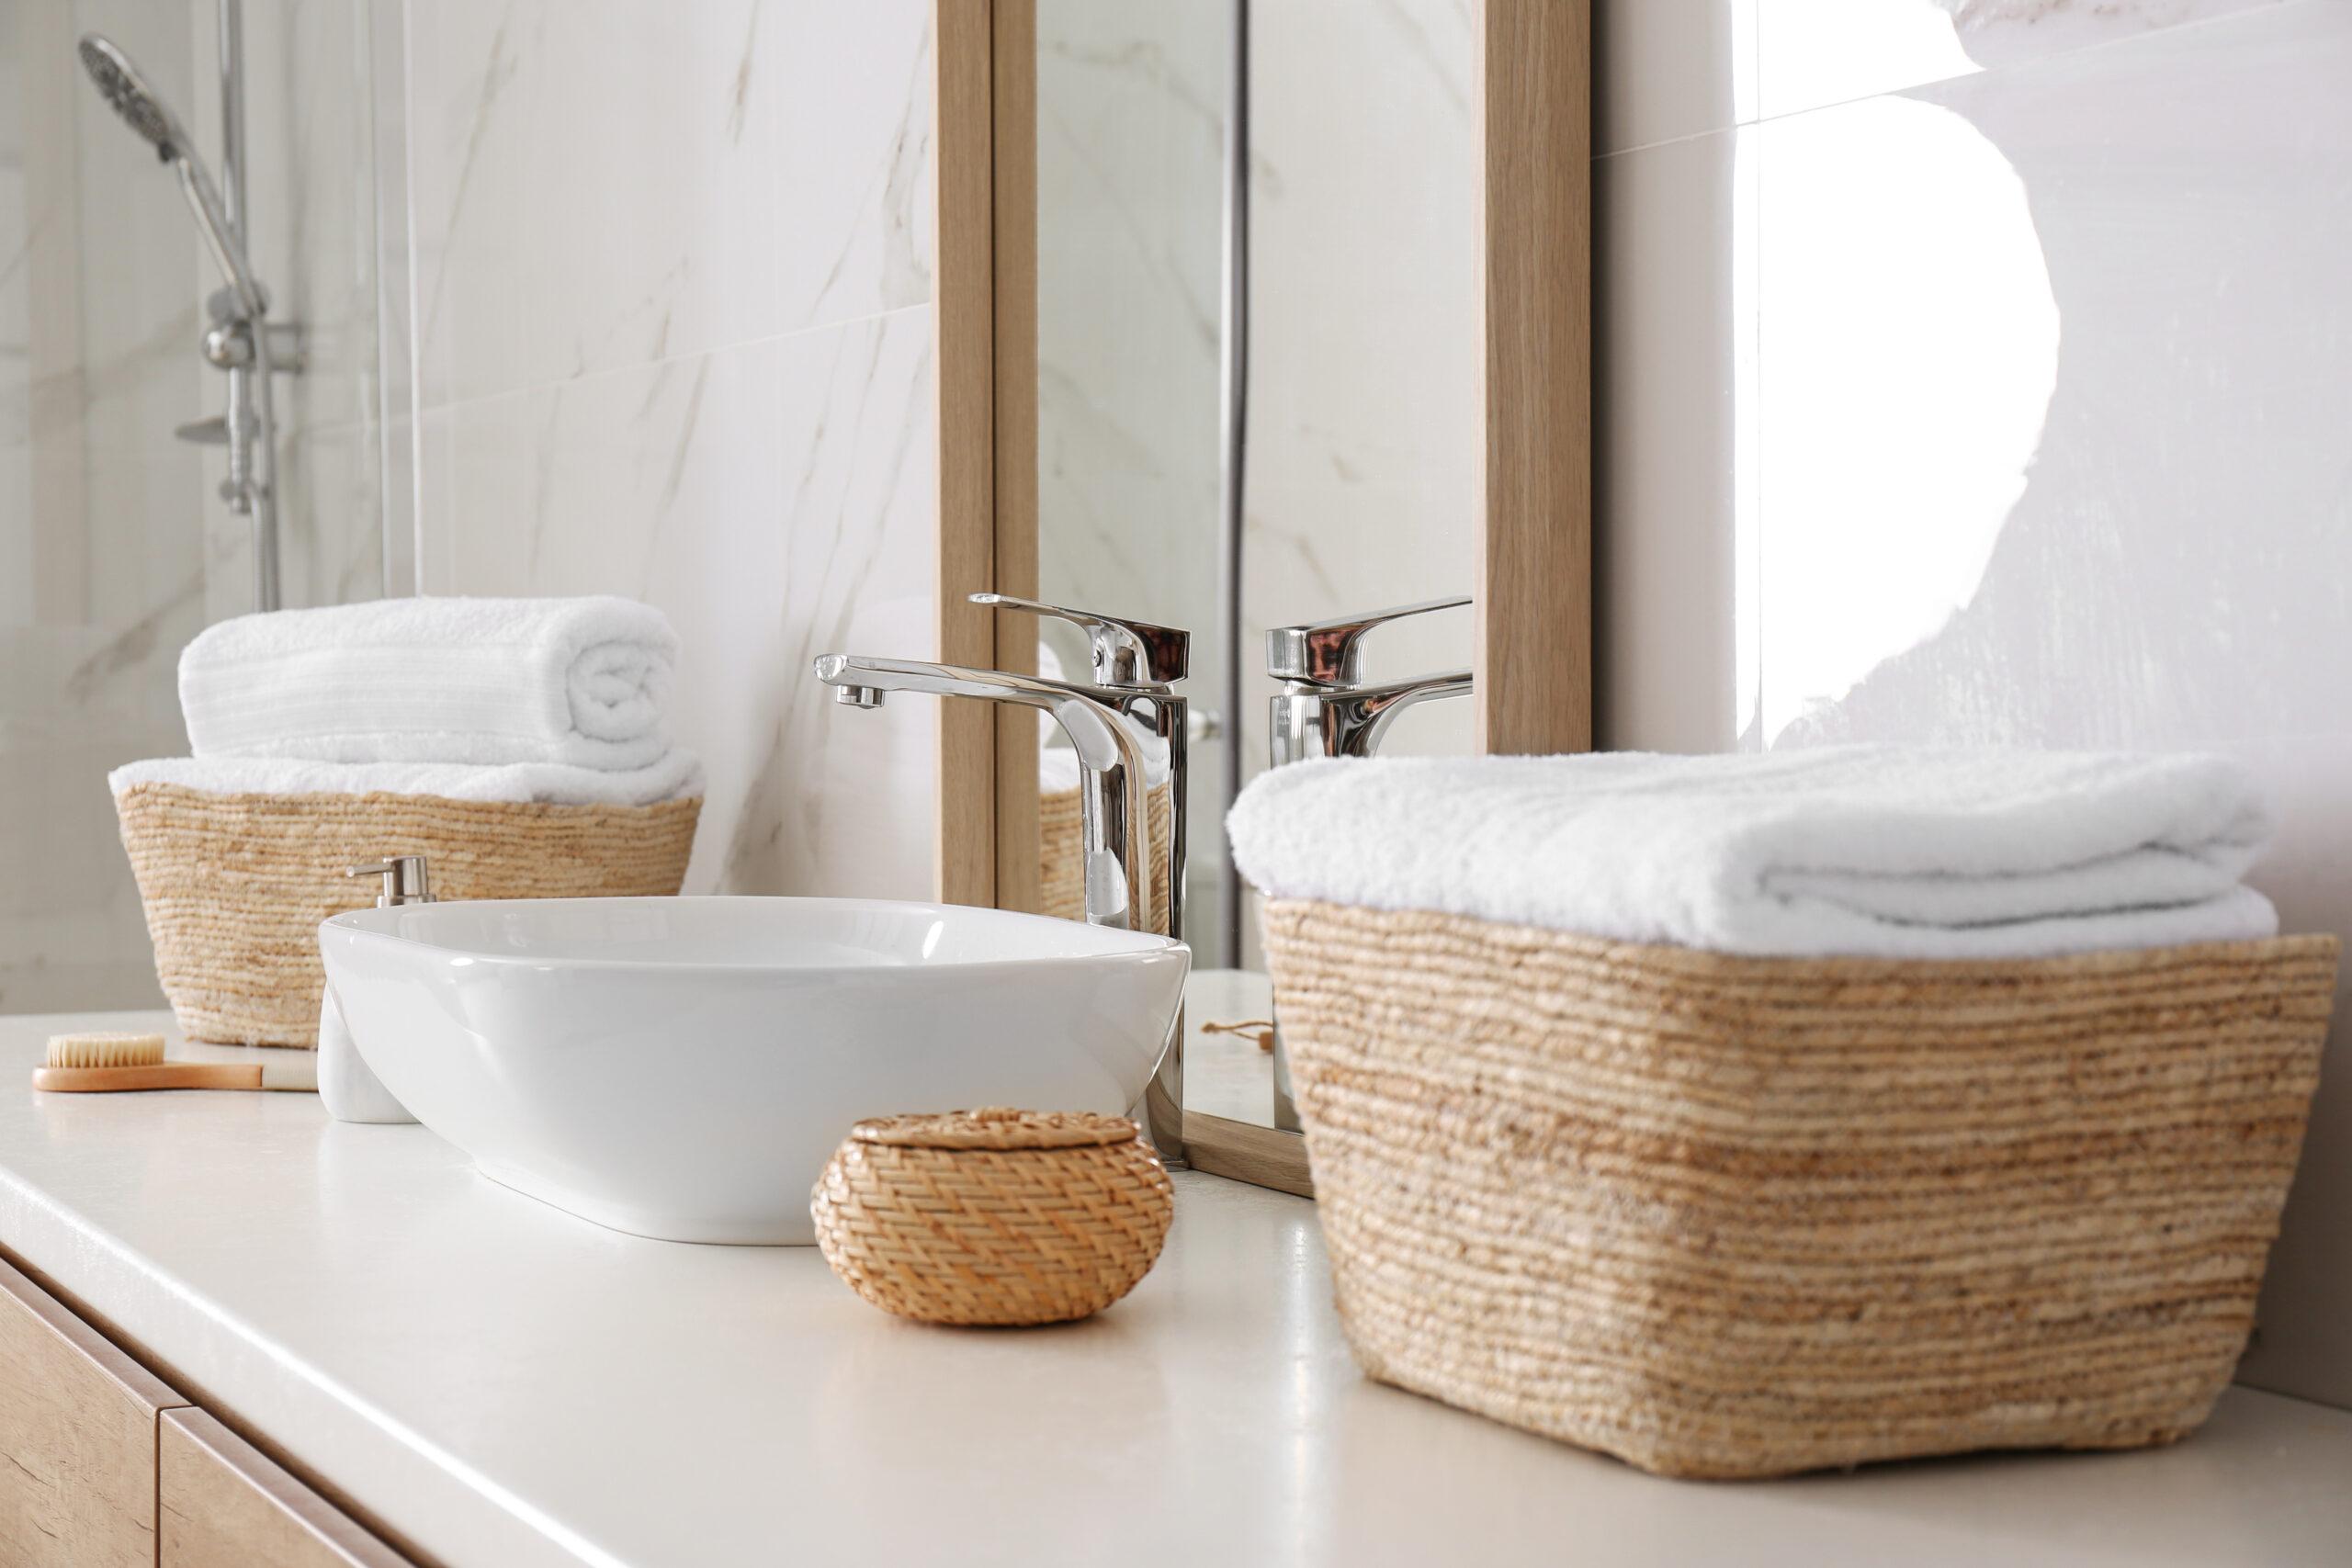 photo salle bain accessoire savon miroir robinet